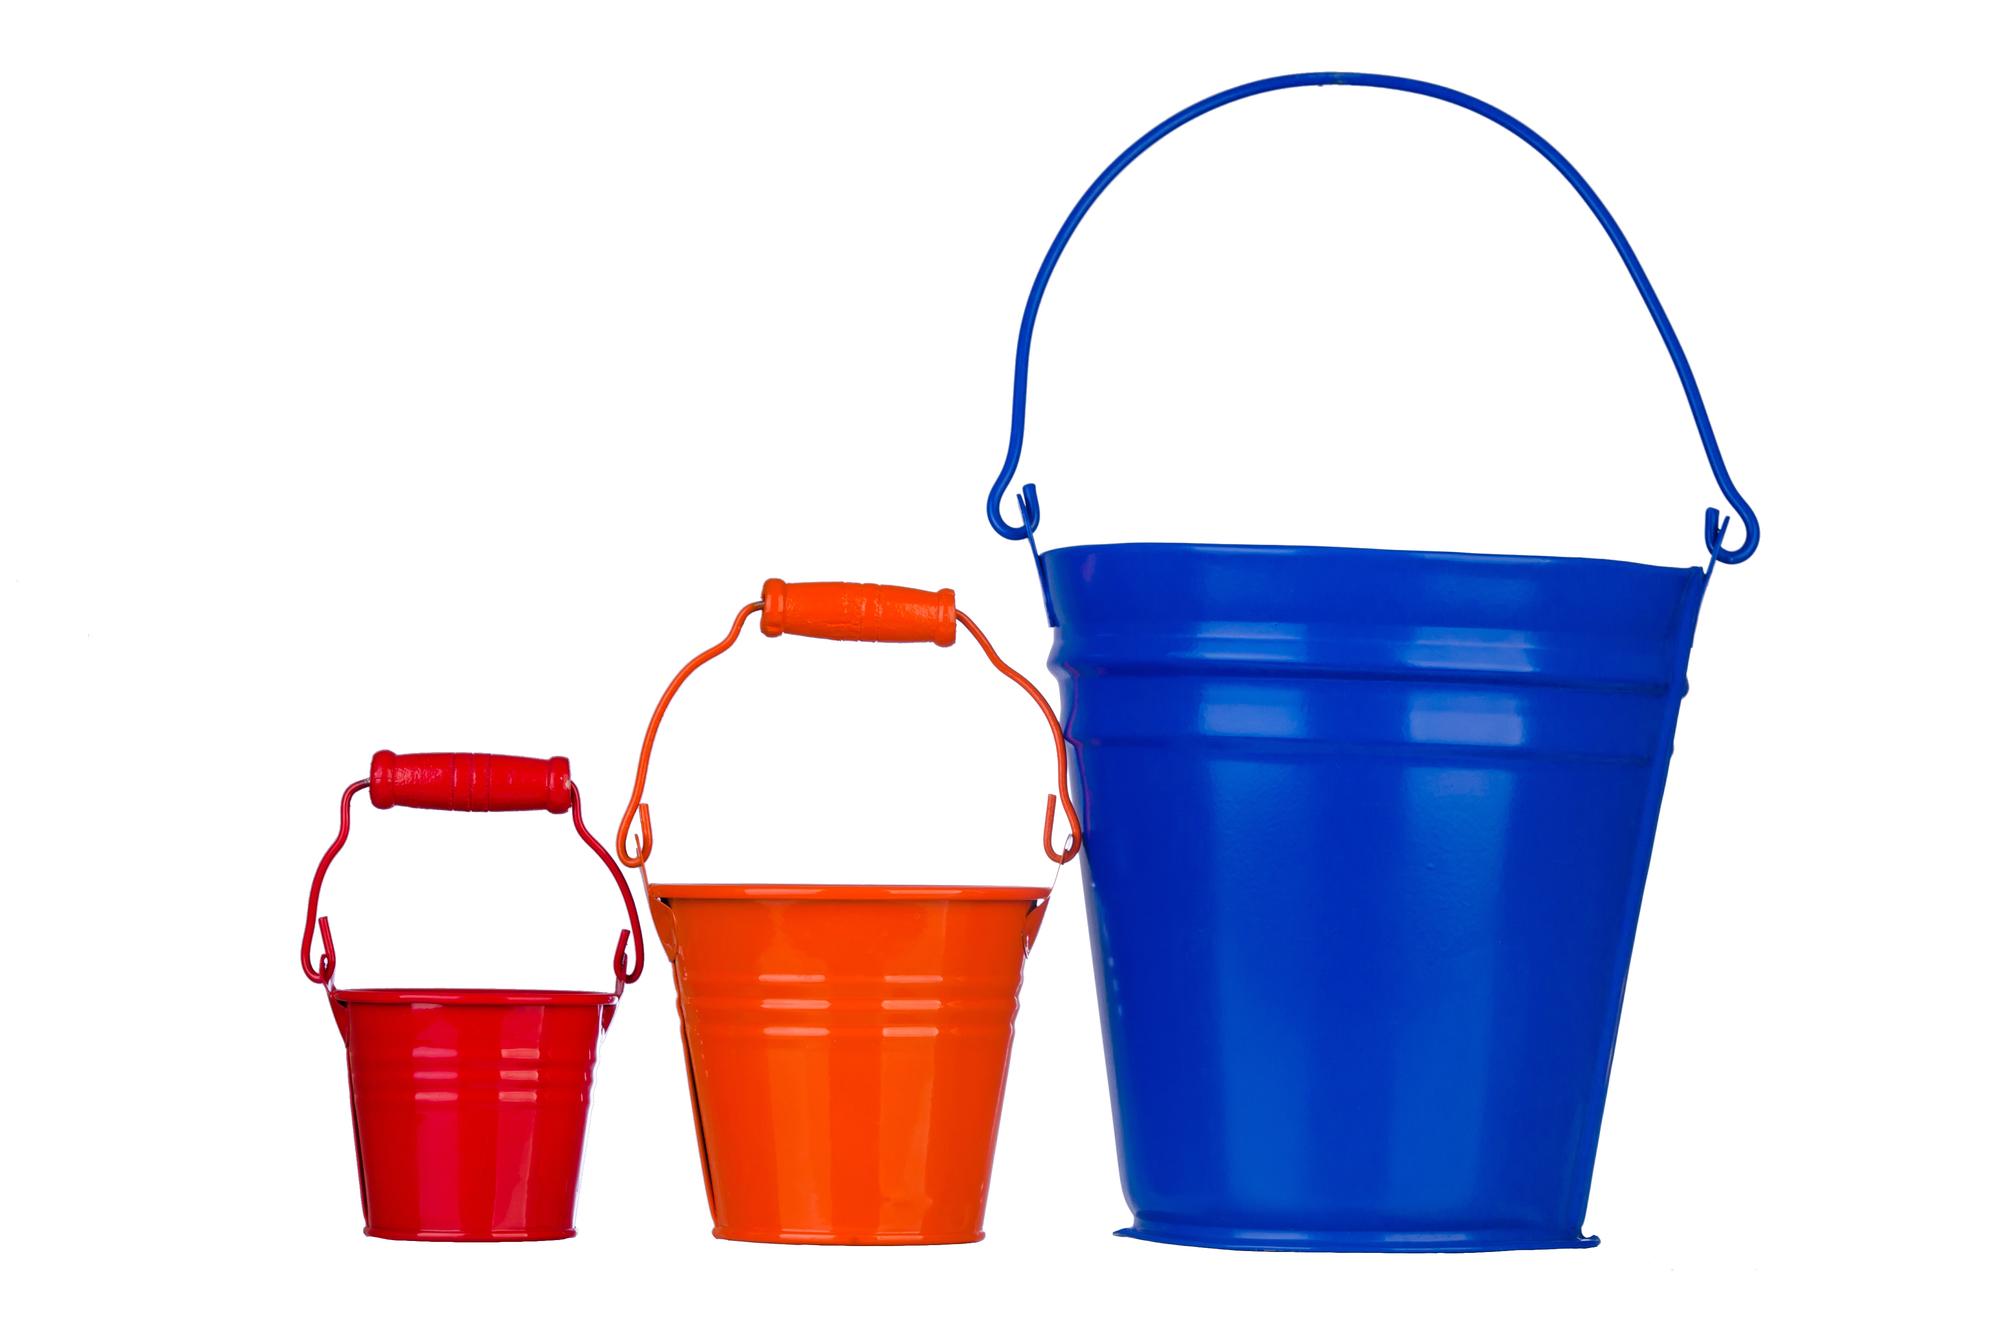 We're gonna need a bigger bucket (image of three buckets)